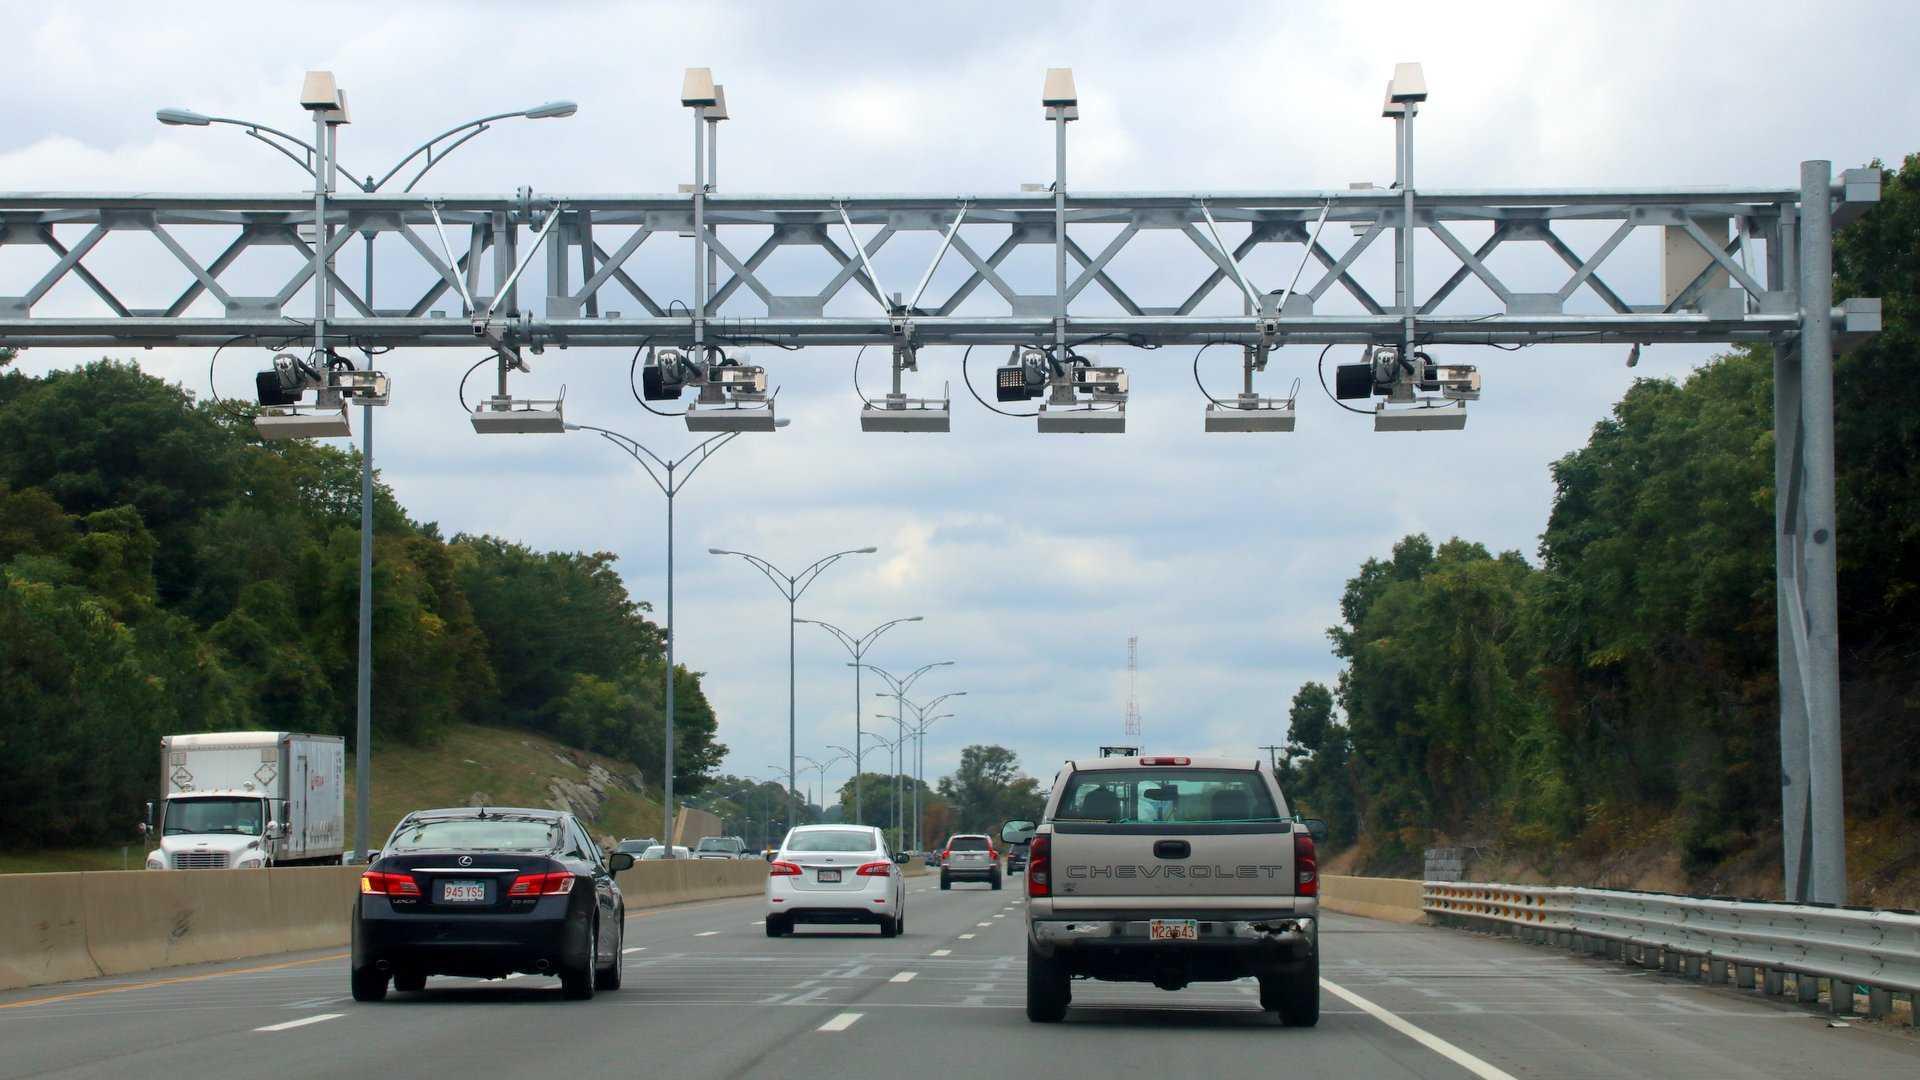 Mass. Turnpike Open Road Tolling